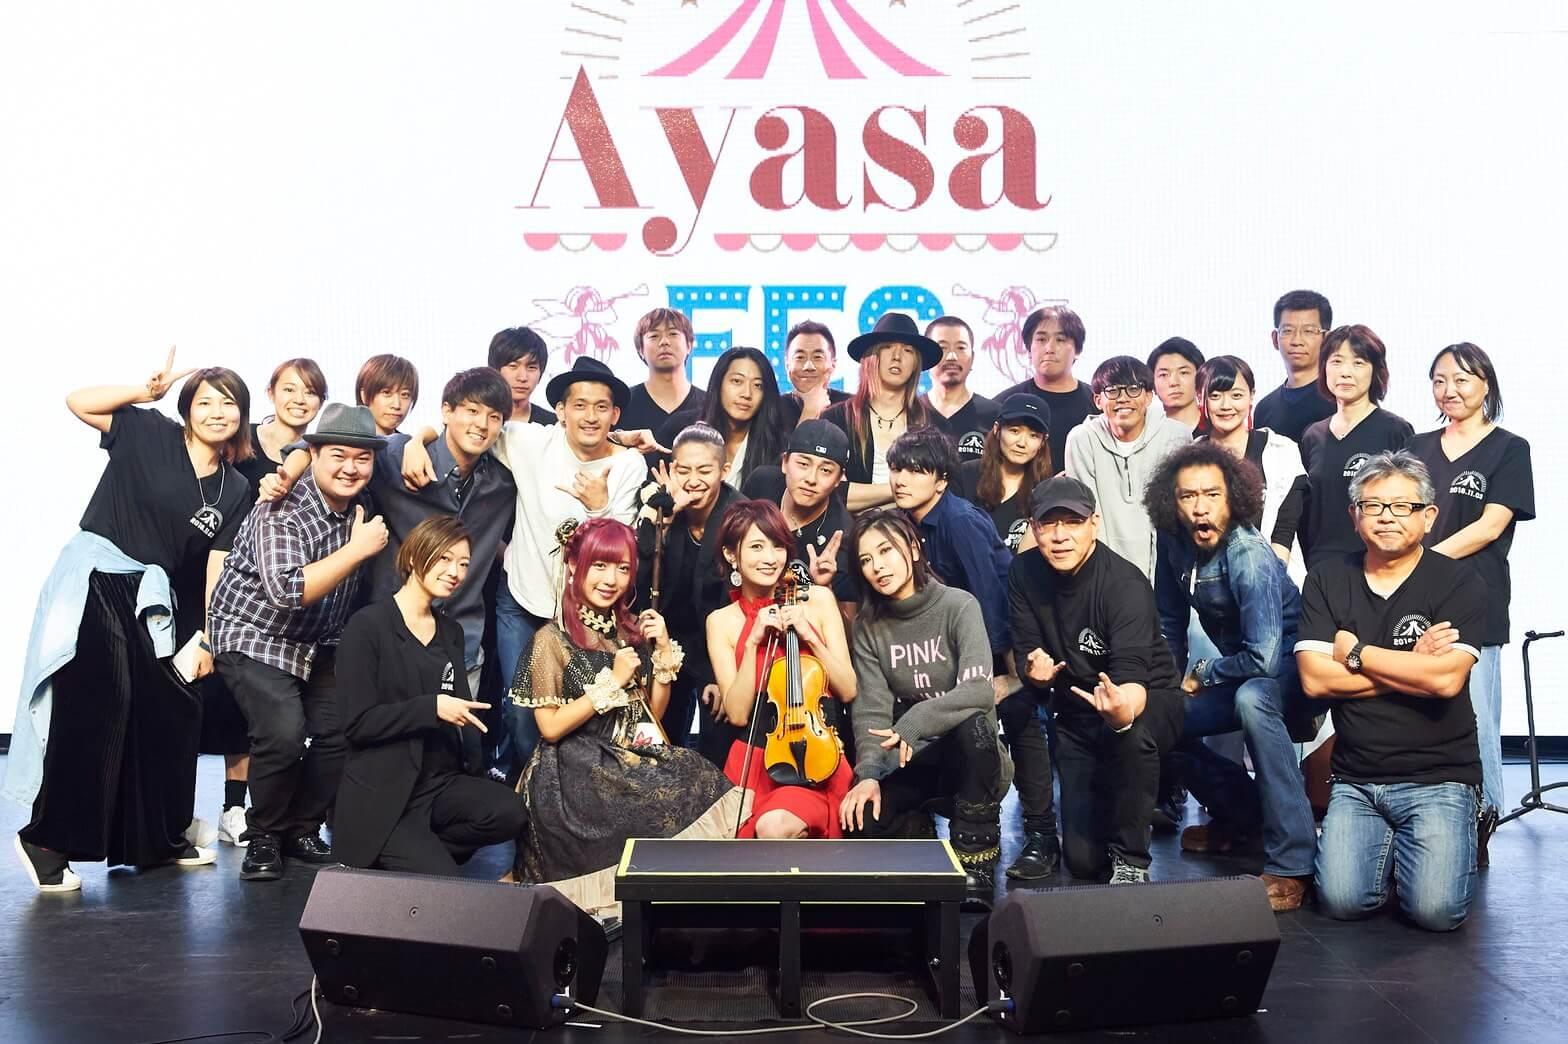 Ayasa Fes 終了!多彩なゲストに会場熱狂サムネイル画像